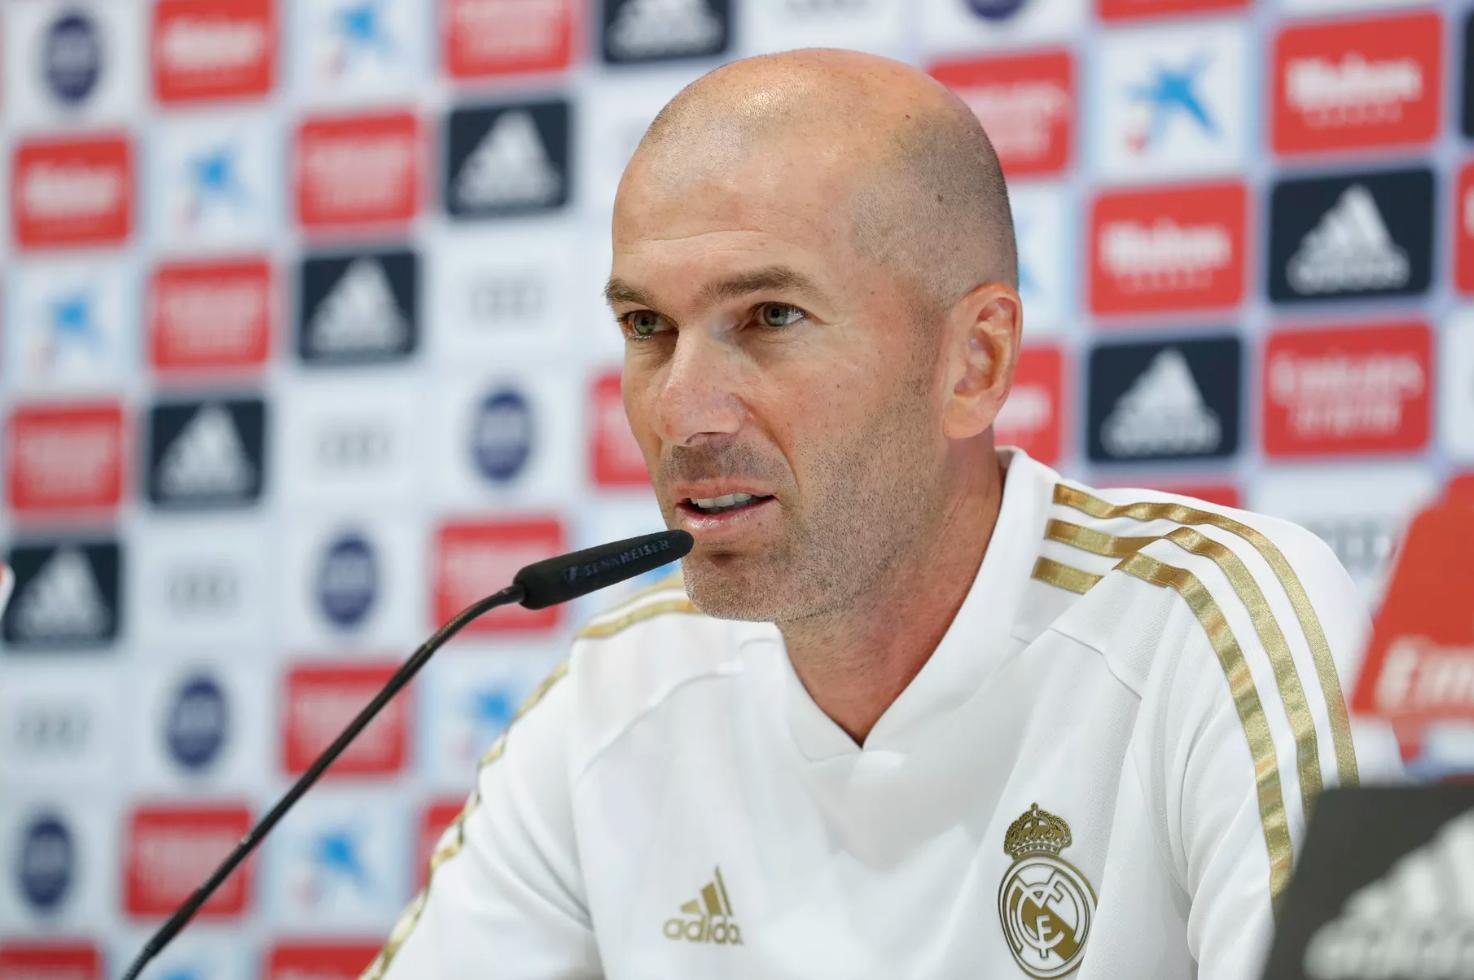 Zidane confirms Bale, Modric, Kroos and Vazquez will all miss match against Mallorca - Bóng Đá